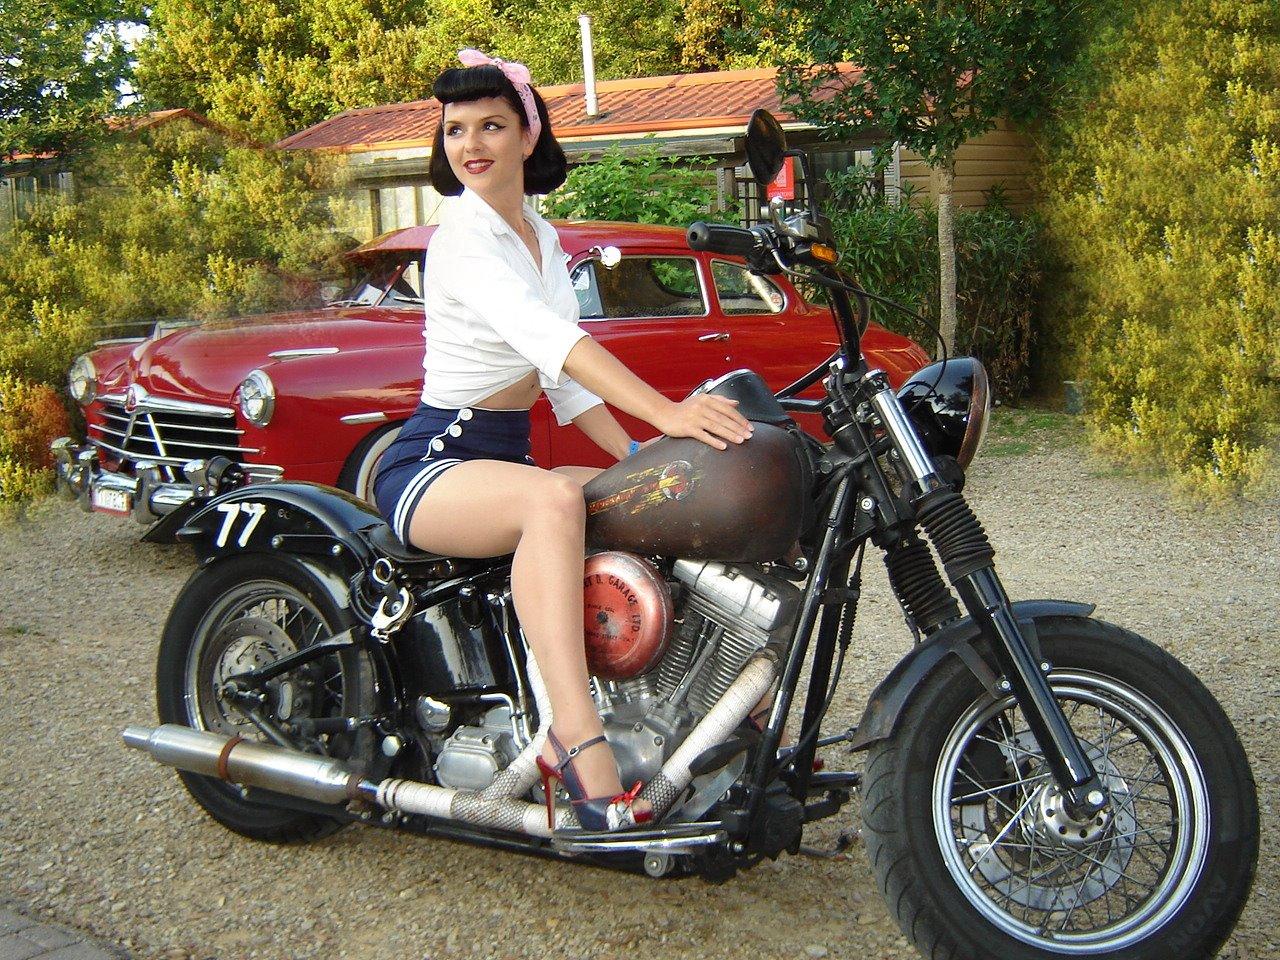 Beautiful Babe On Harley Davidson Motorcycle Wallpaper    Pin Up Girl 1280x960